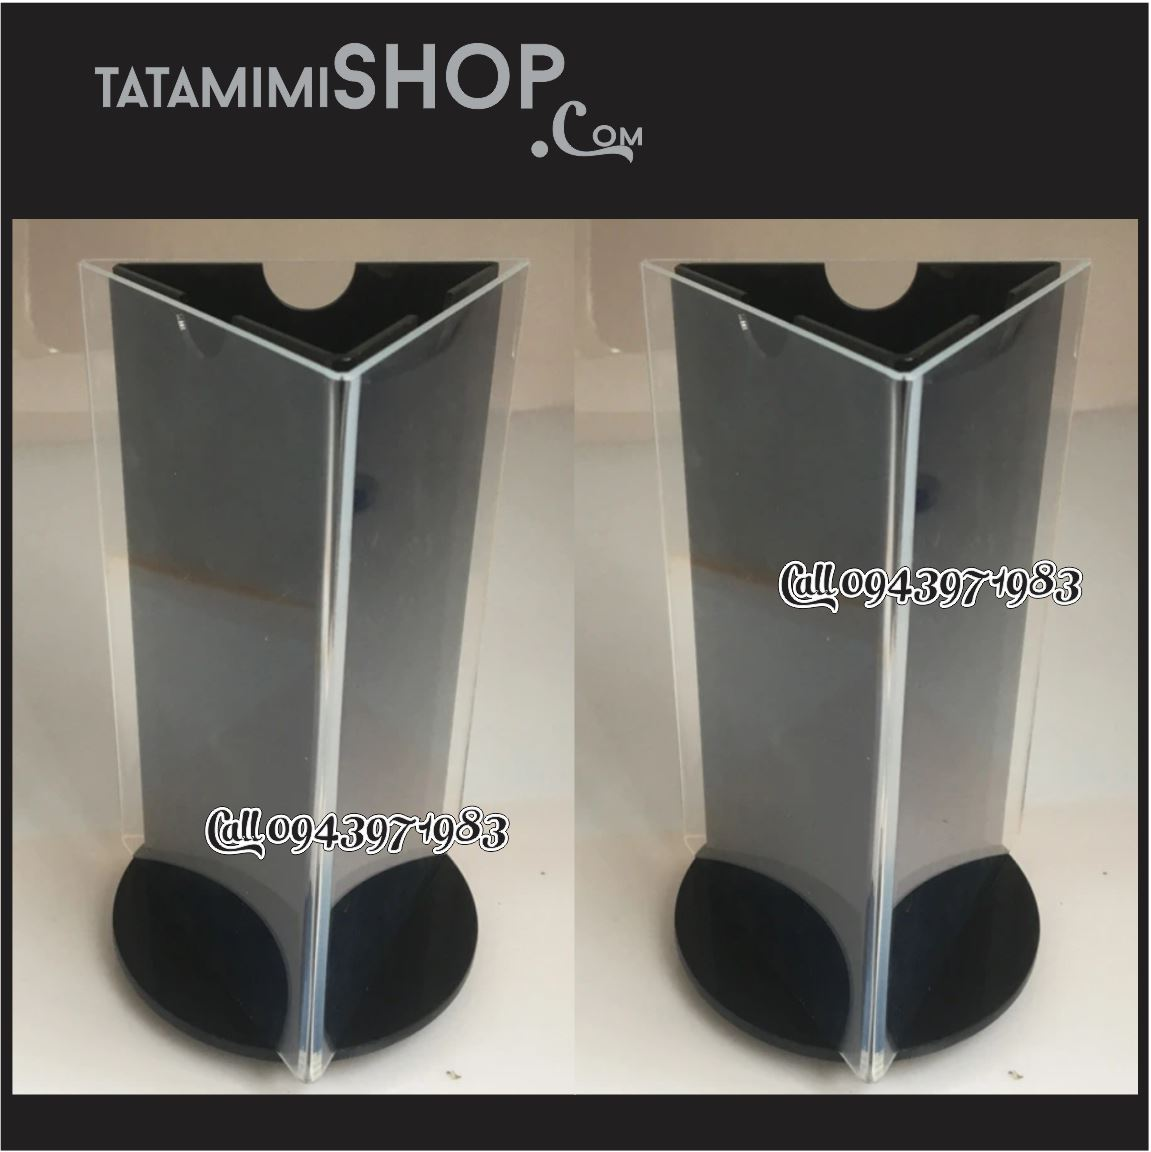 Kệ mica xoay 3 mặt A4 Gập 3 | TATAMIMISHOP.COM